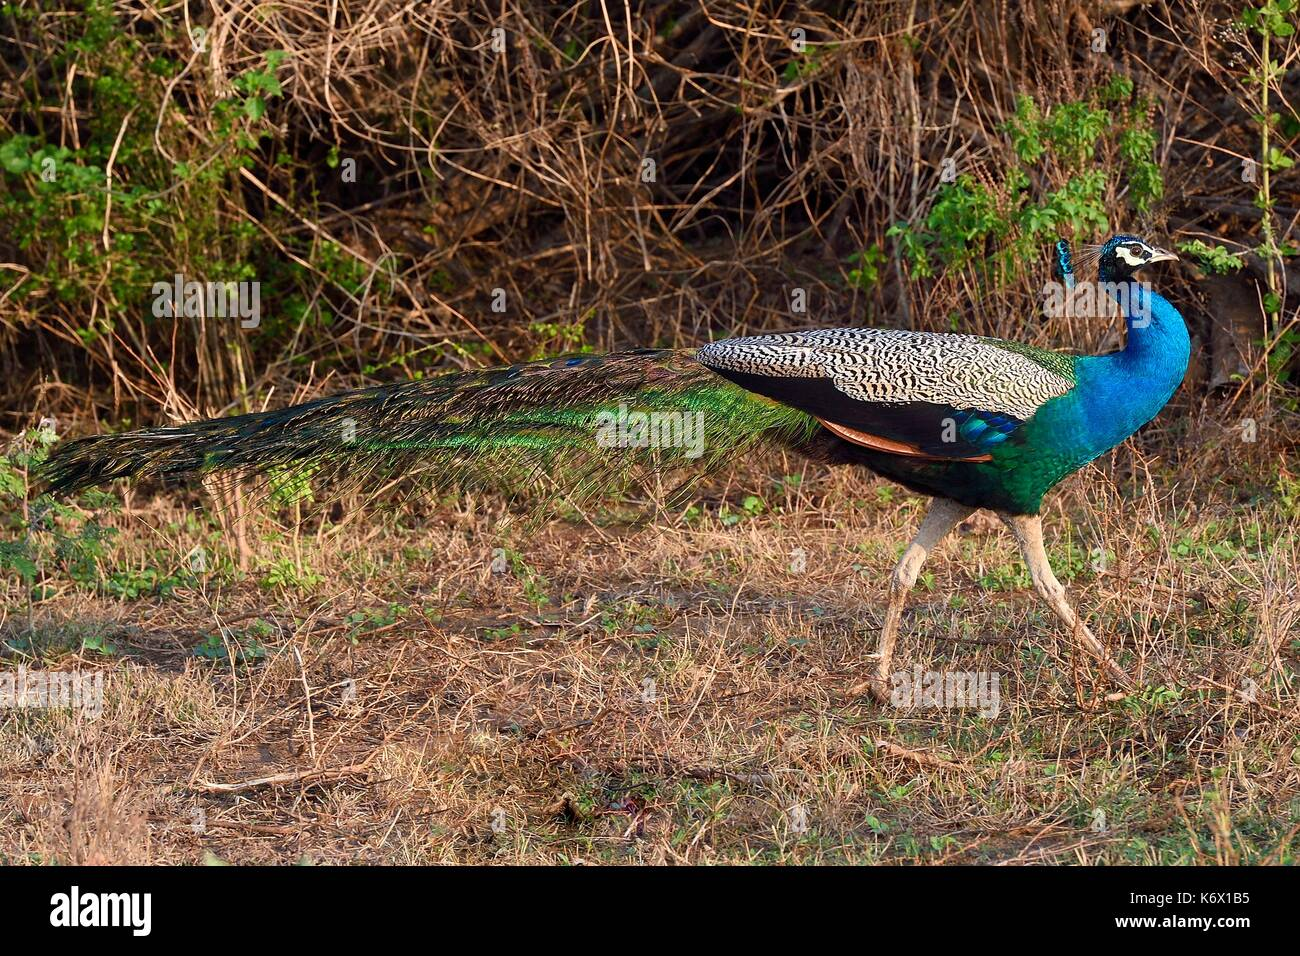 Sri Lanka, Uva province, Udawalawe National Park, indian peafowl or blue peafowl (Pavo cristatus) - Stock Image